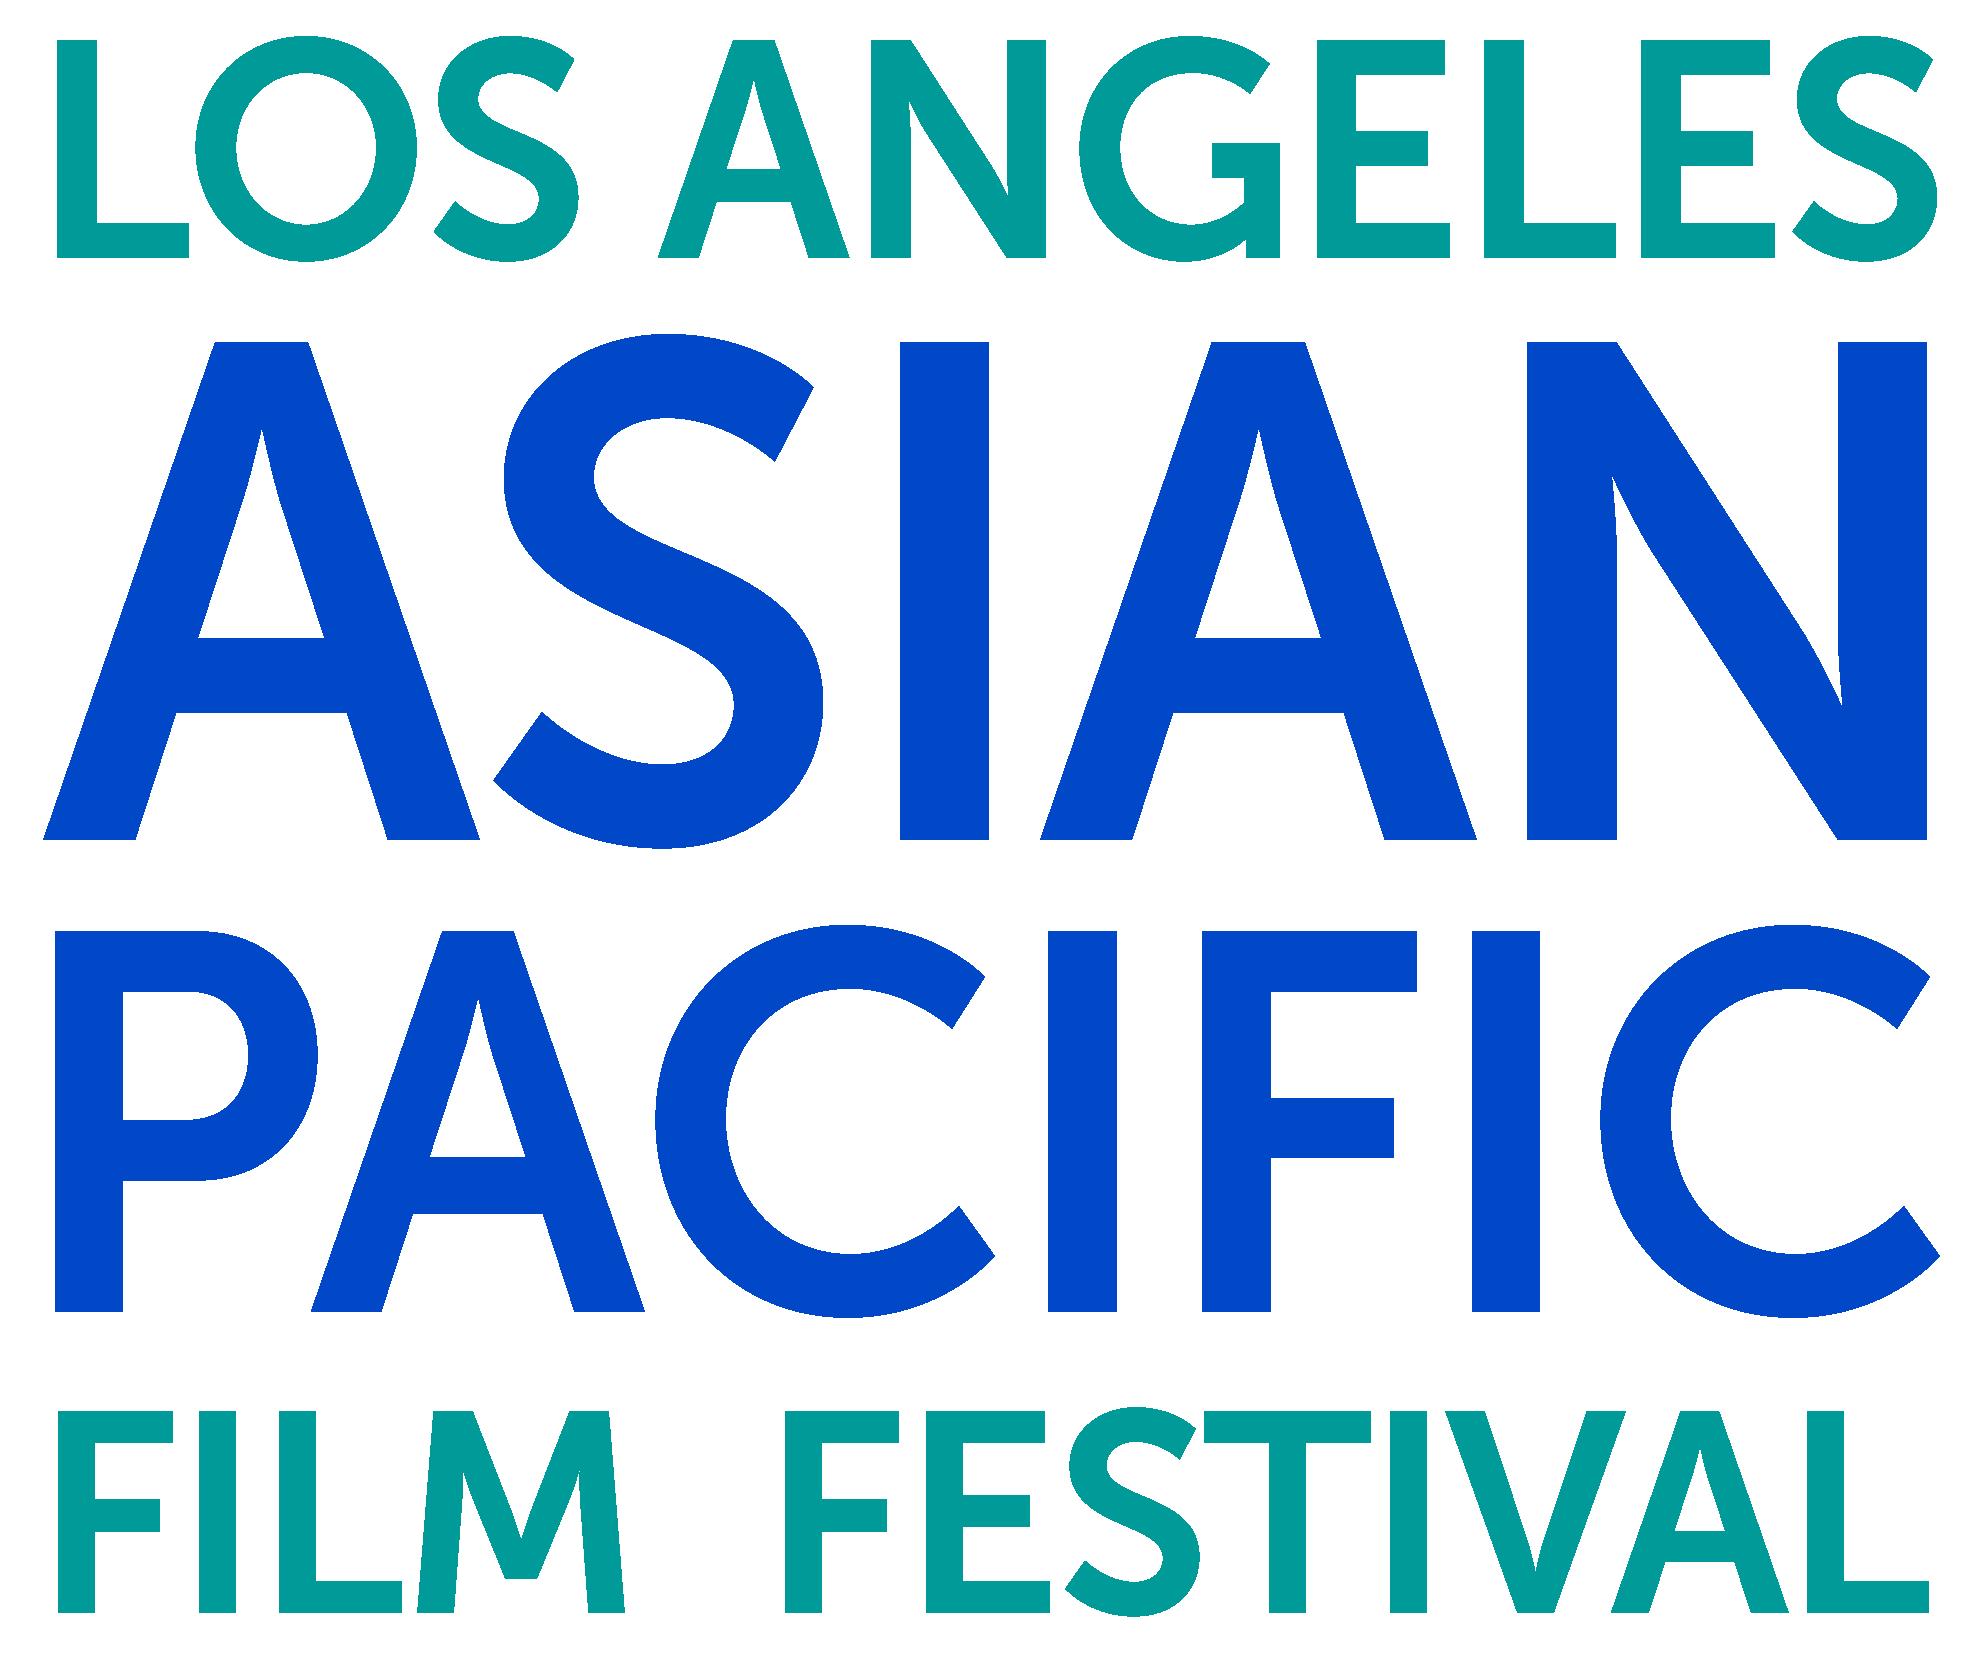 2021 Los Angeles Asian Pacific Film Festival